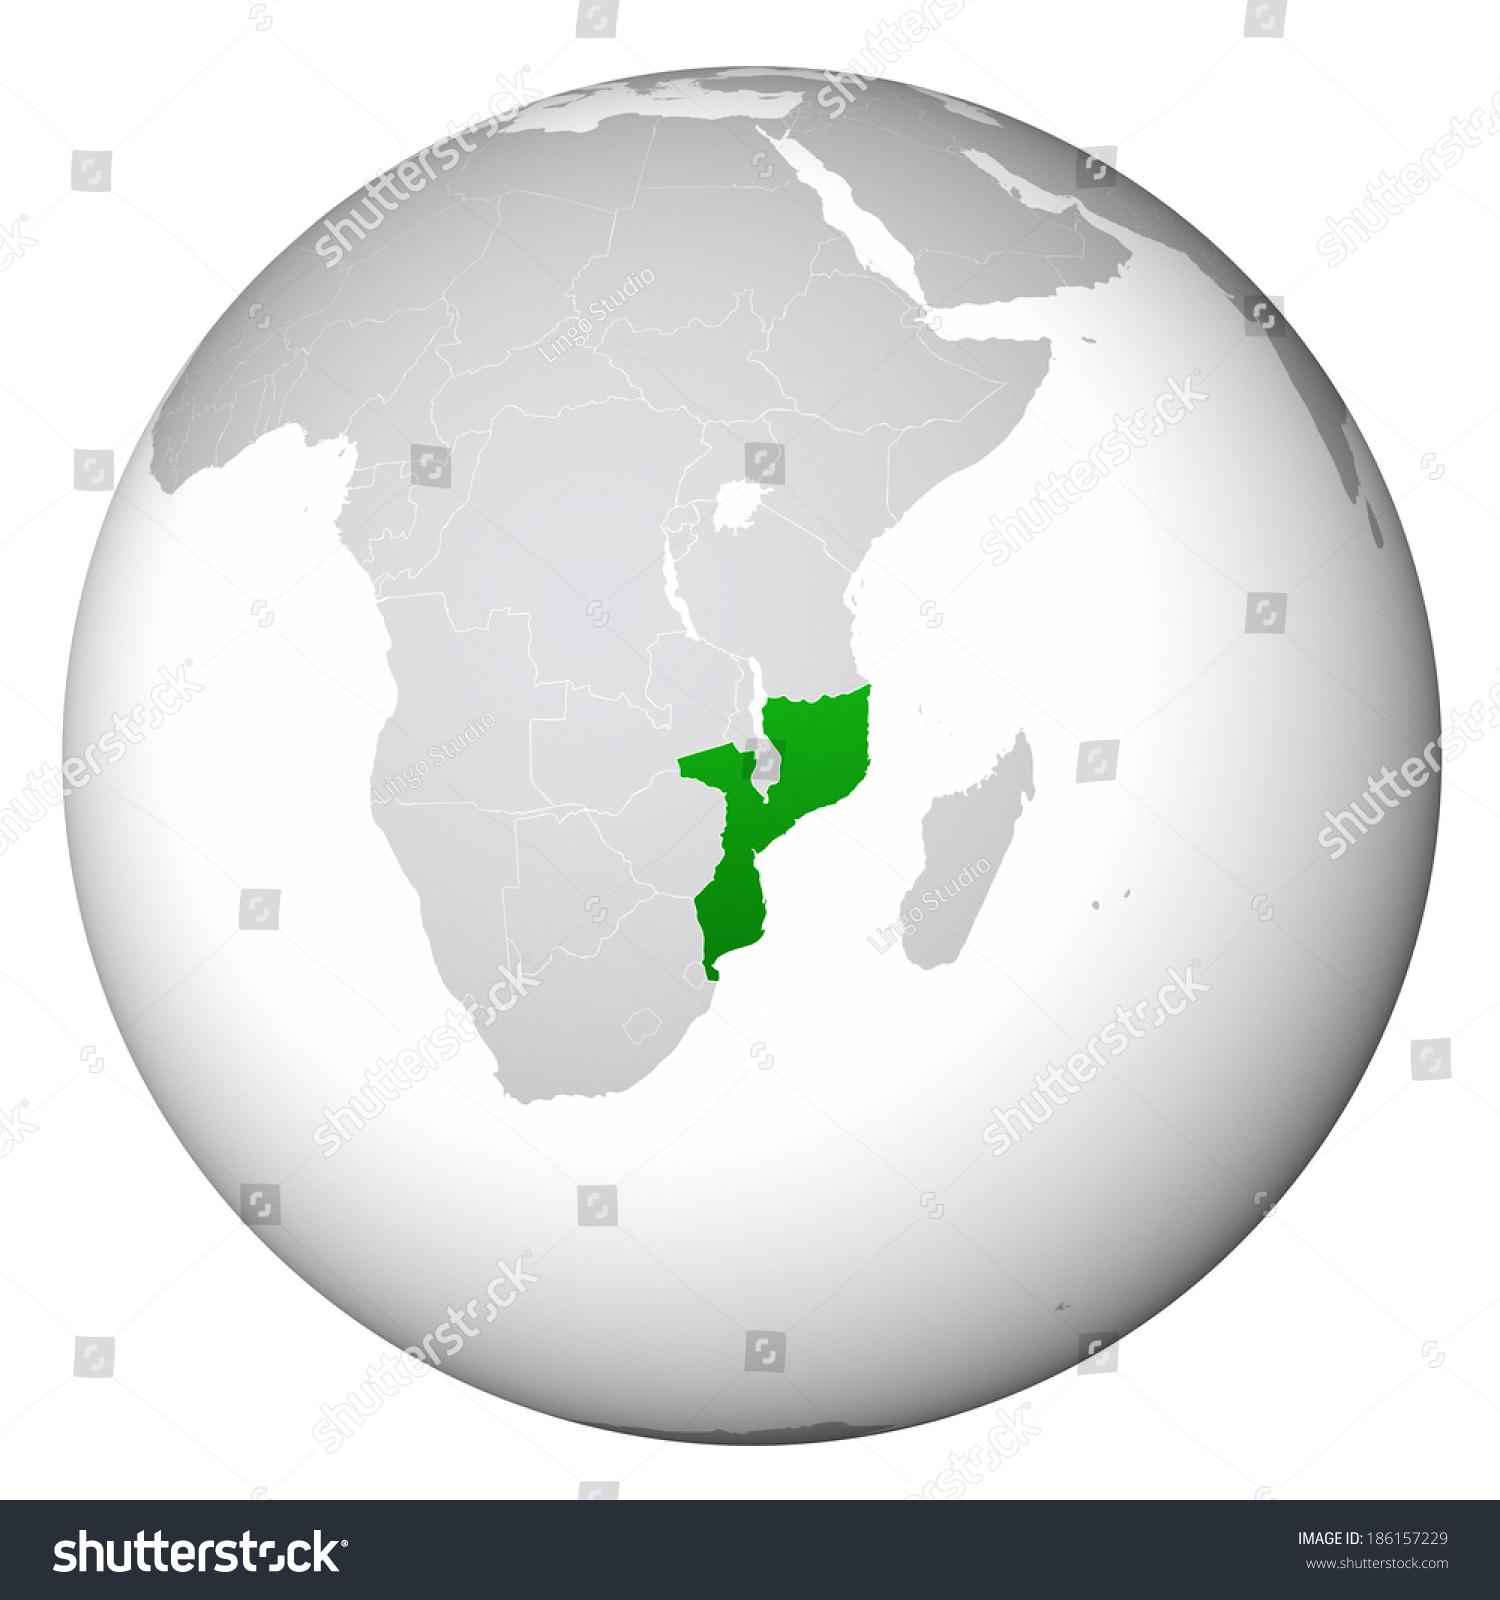 World map mozambique stock illustration 186157229 shutterstock world map mozambique gumiabroncs Image collections